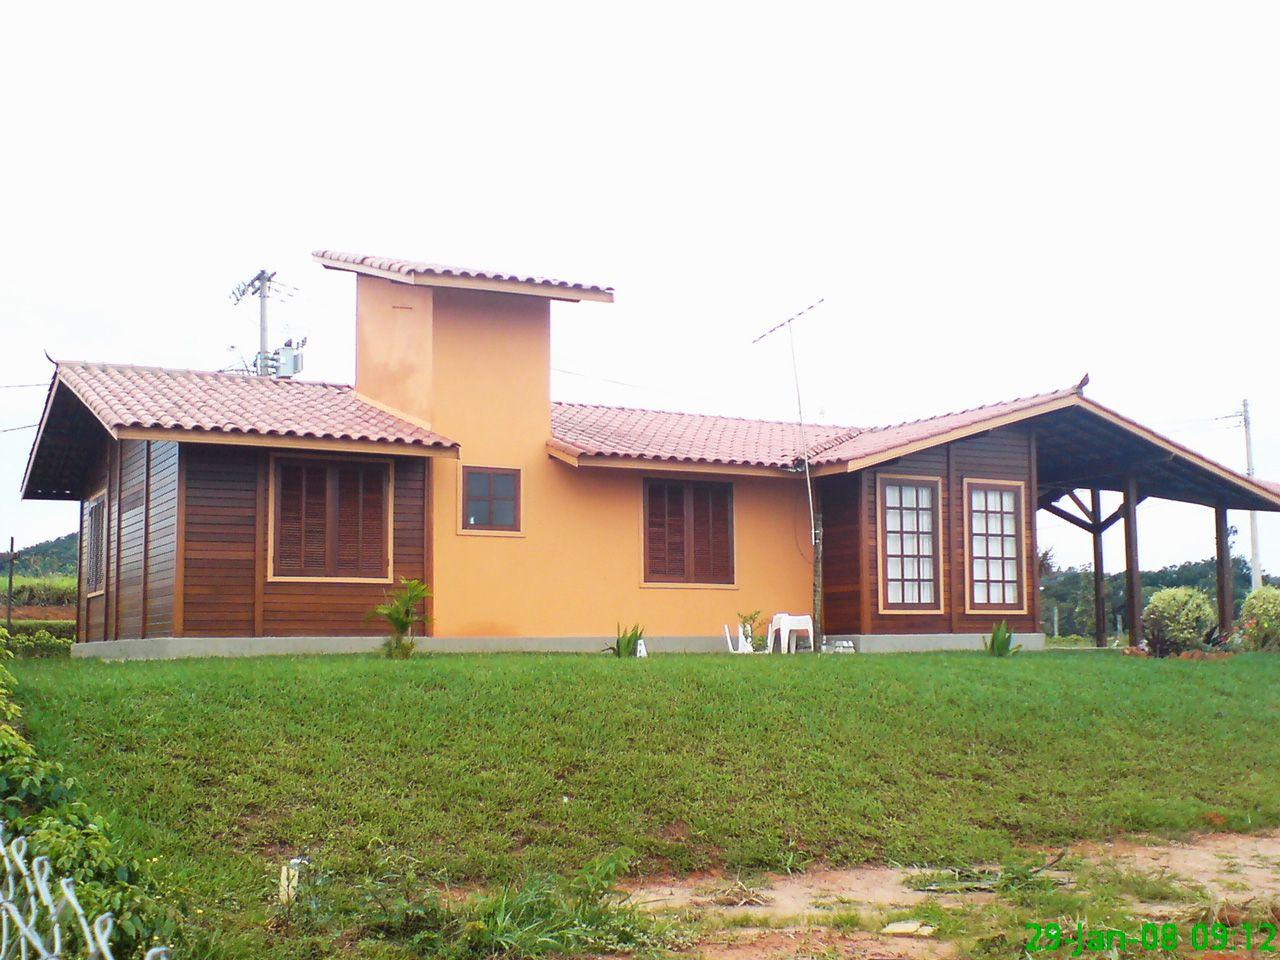 obras realizadas  u00ab brasil casas casas de madeira Tan Large Homes Tan Large Homes